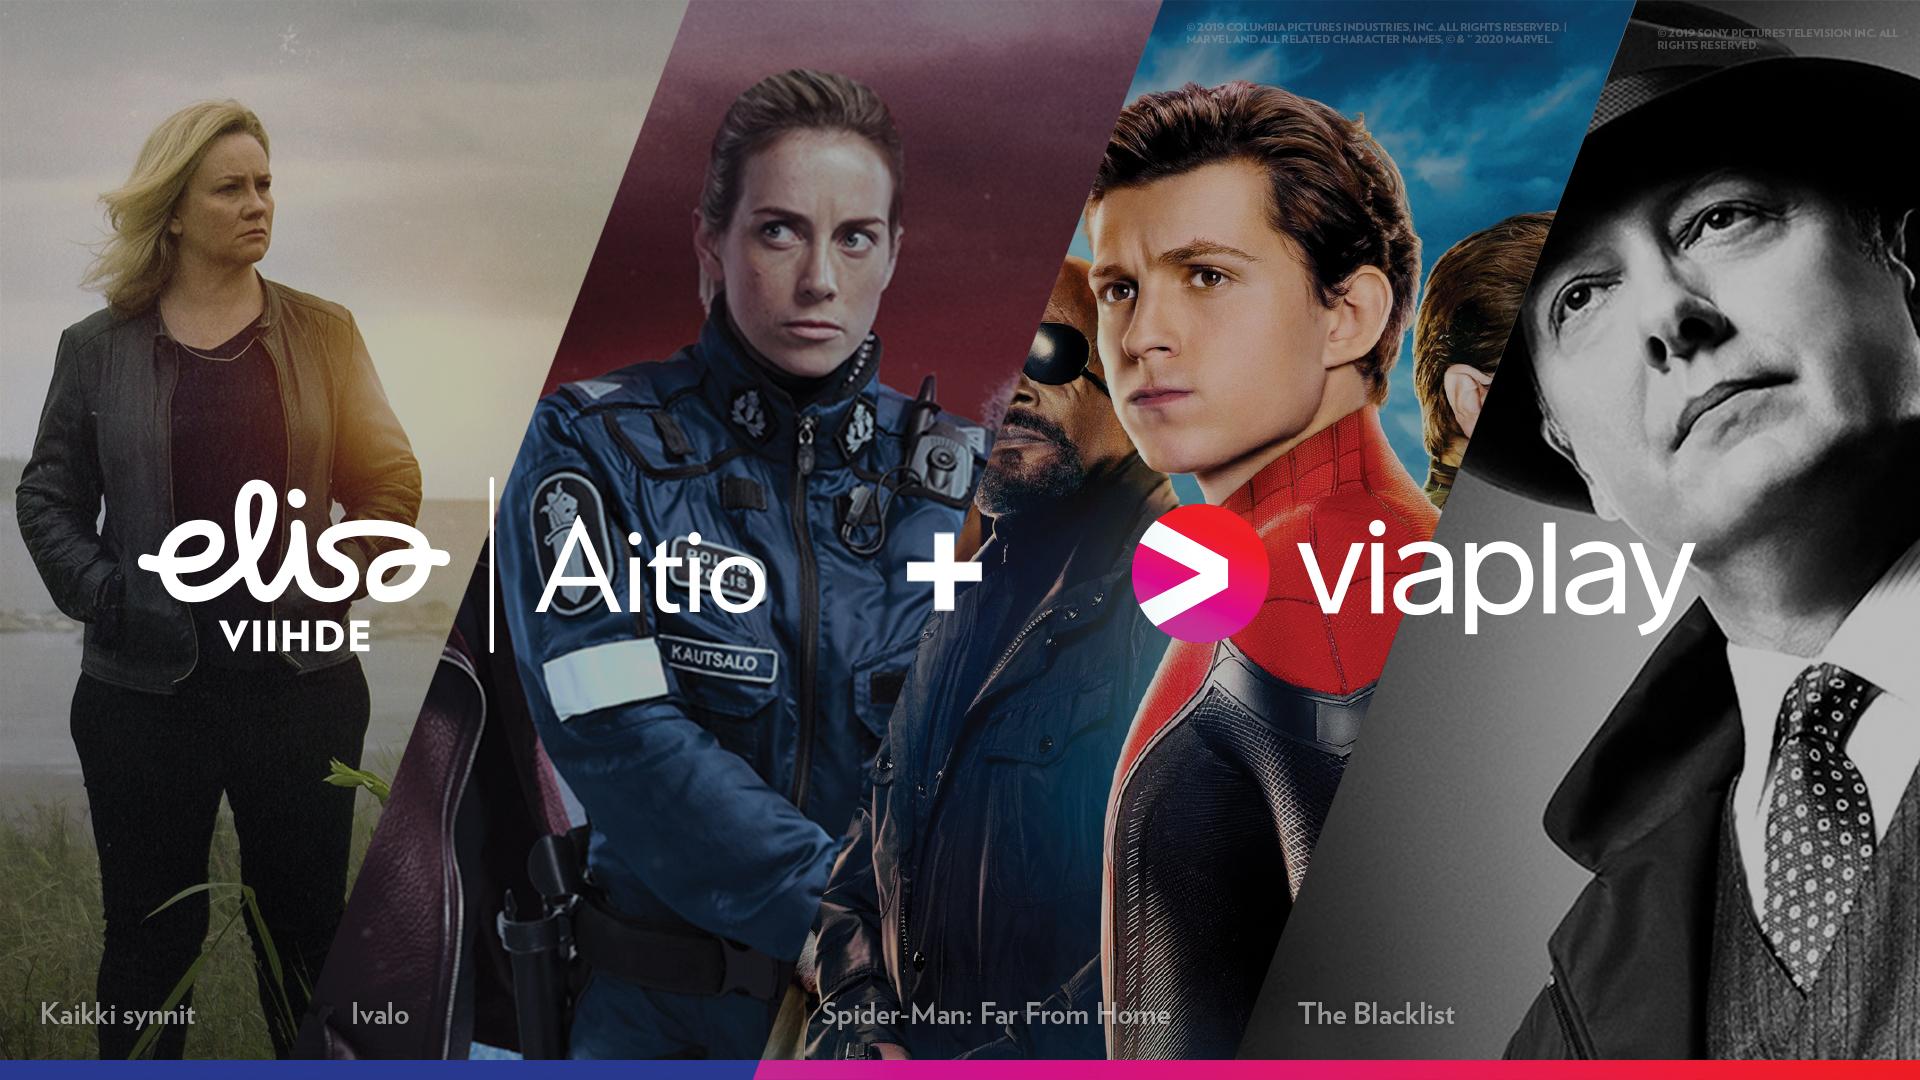 Now people can enjoy the elisa entertainment Premium (elisa viihde premium) service